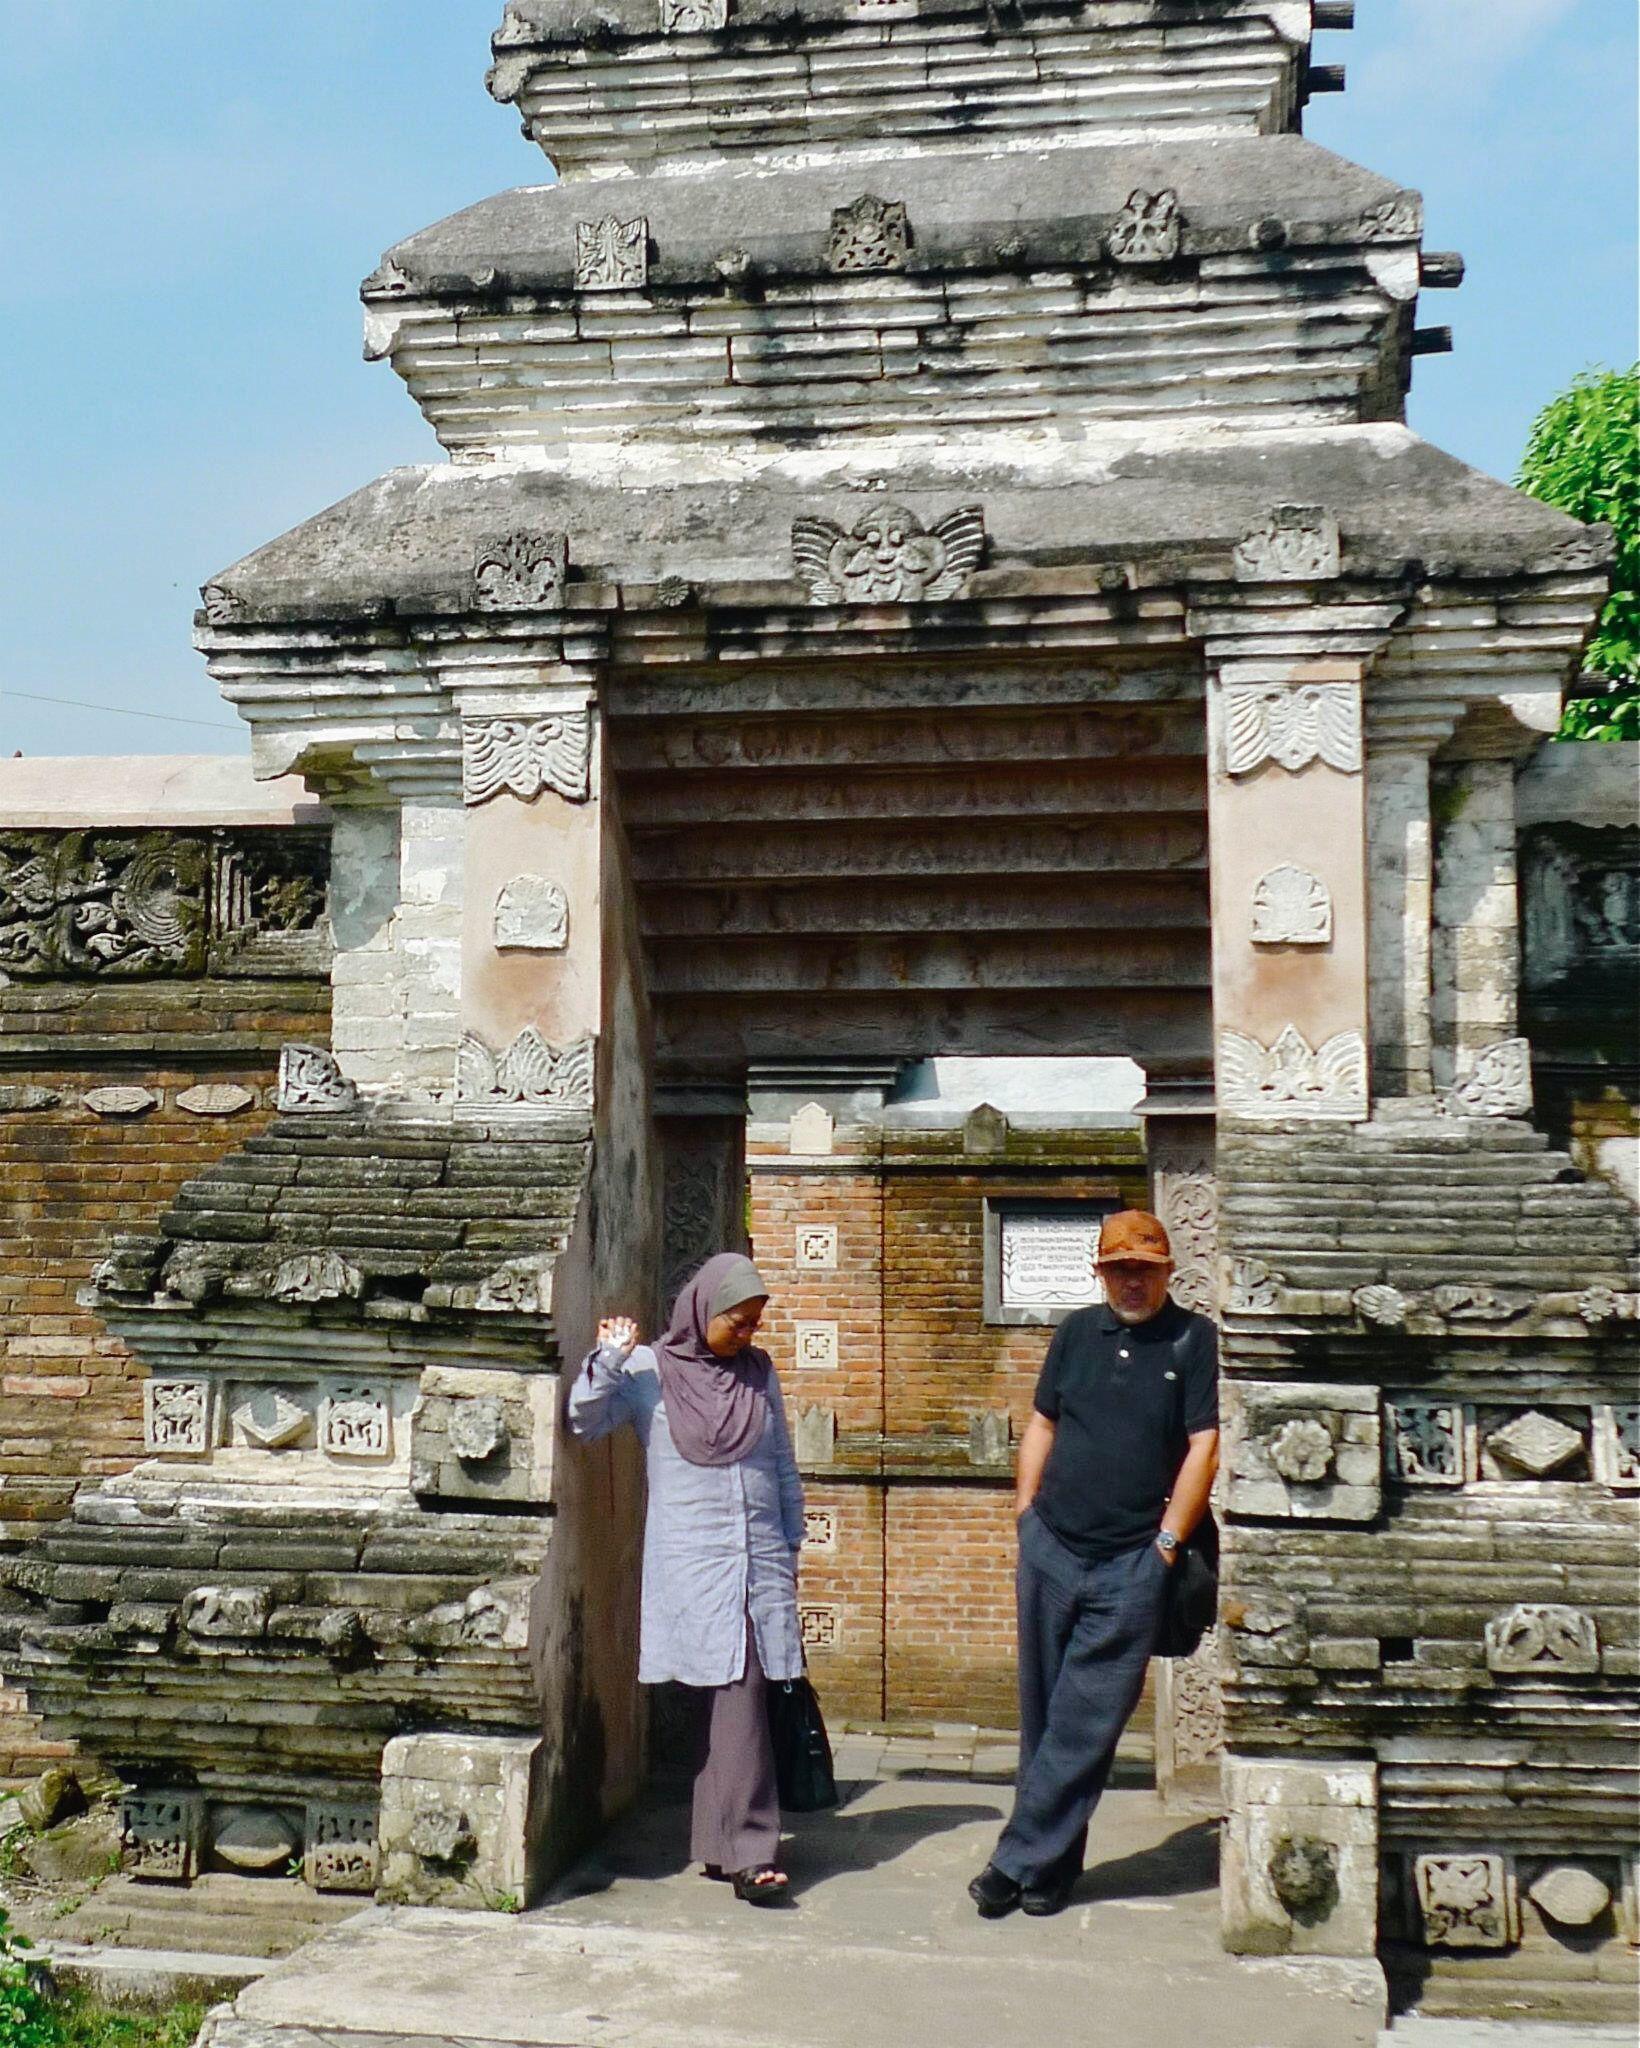 MOHD HATTA ETJANN NORIZAN AWANG JOGJA INDONESIA DIA ArT TRAVeL ATeLIER DiA TRAVeL